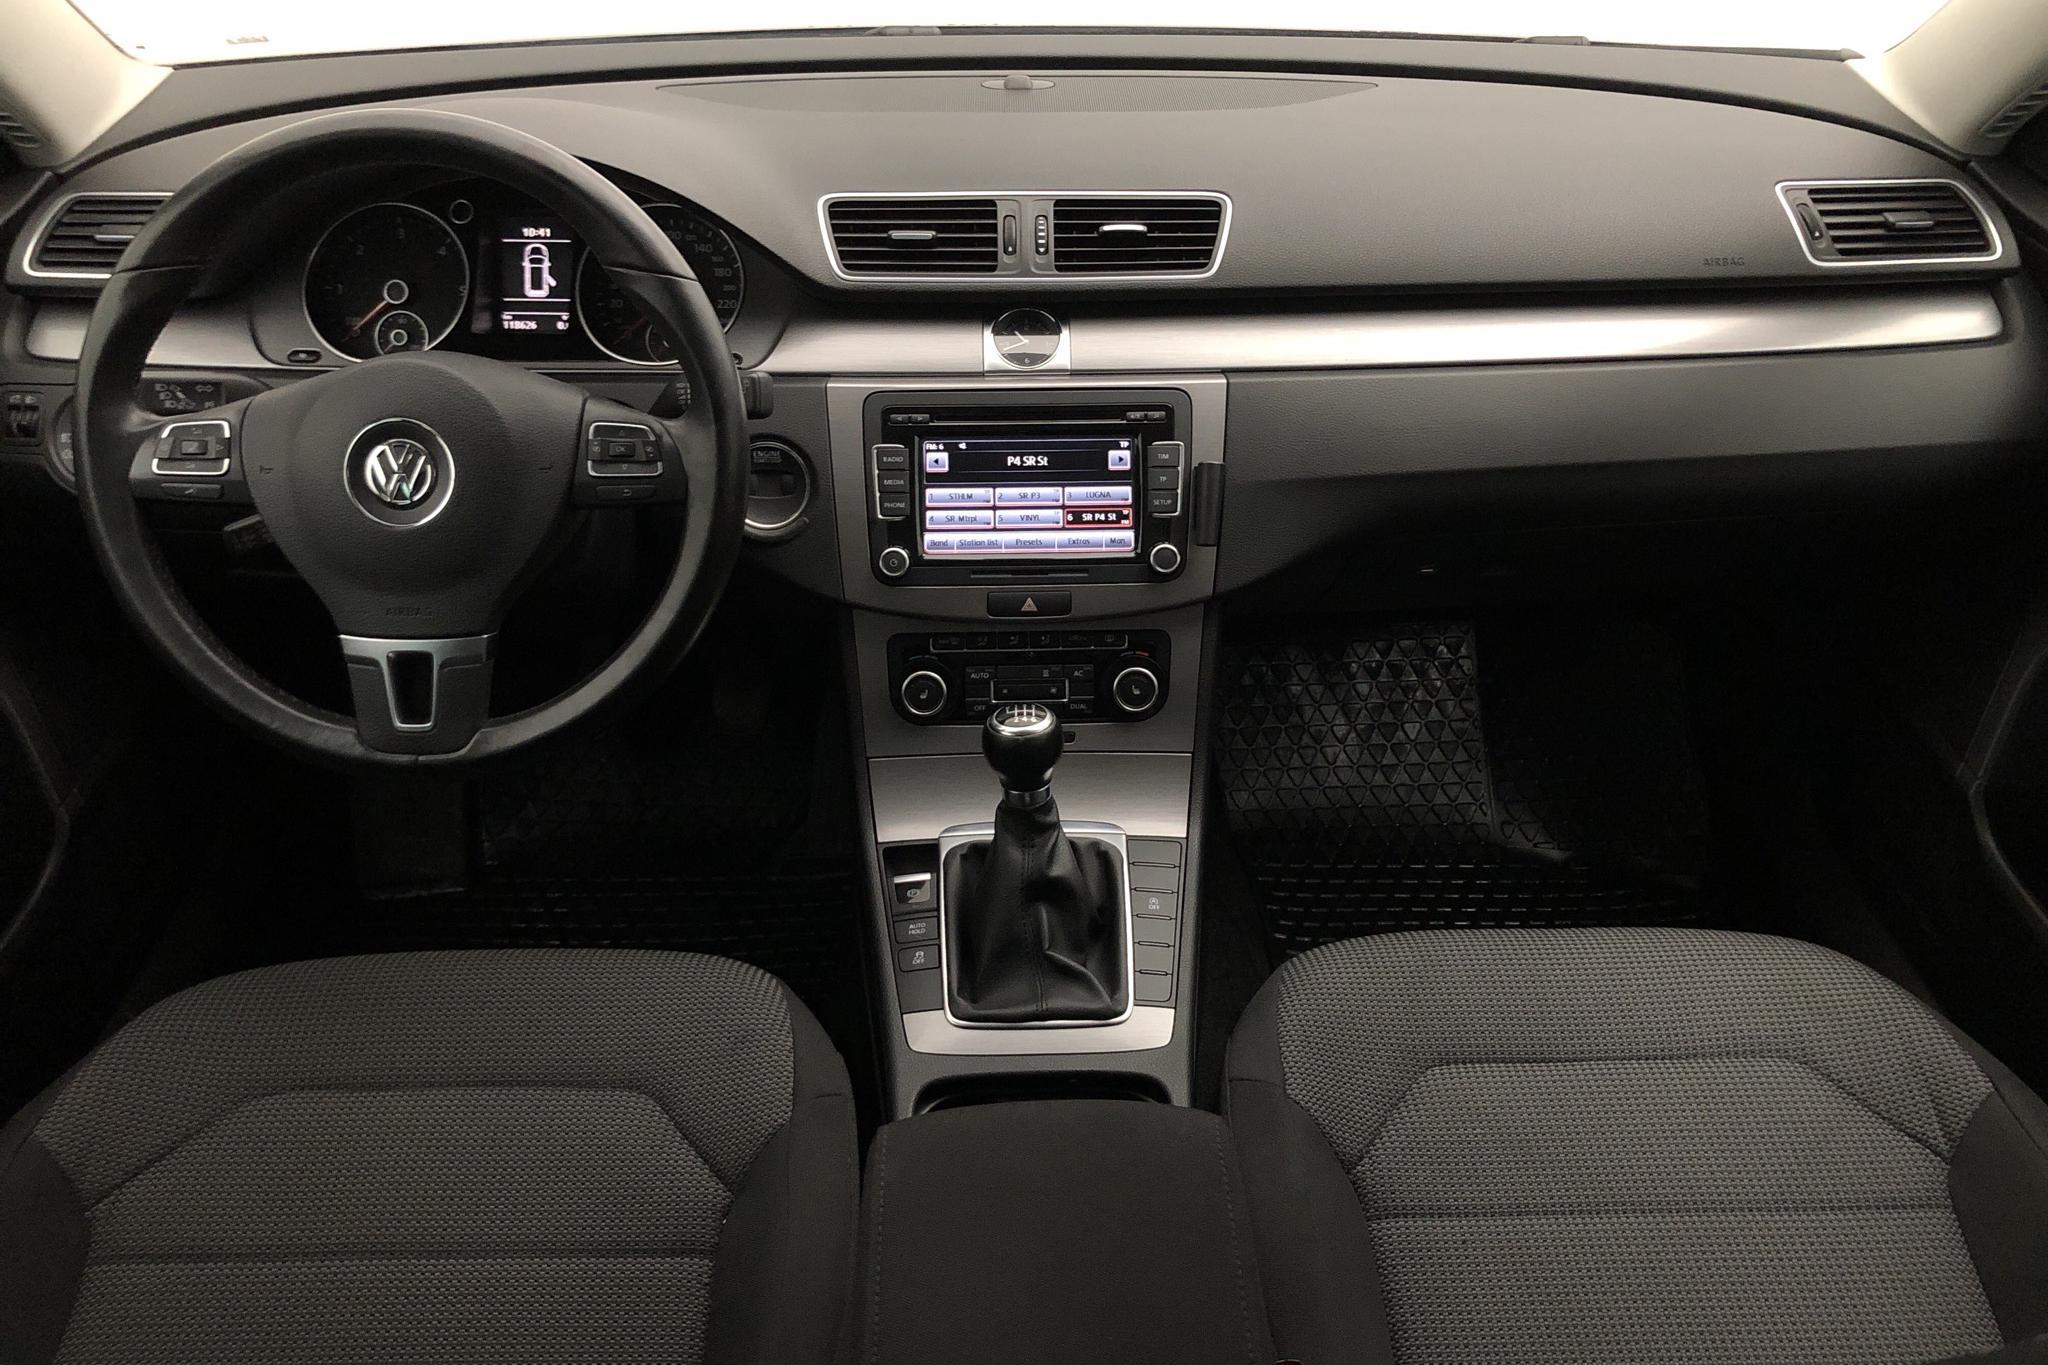 VW Passat 2.0 TDI BlueMotion Technology Variant (140hk) - 11 862 mil - Manuell - Light Brown - 2012